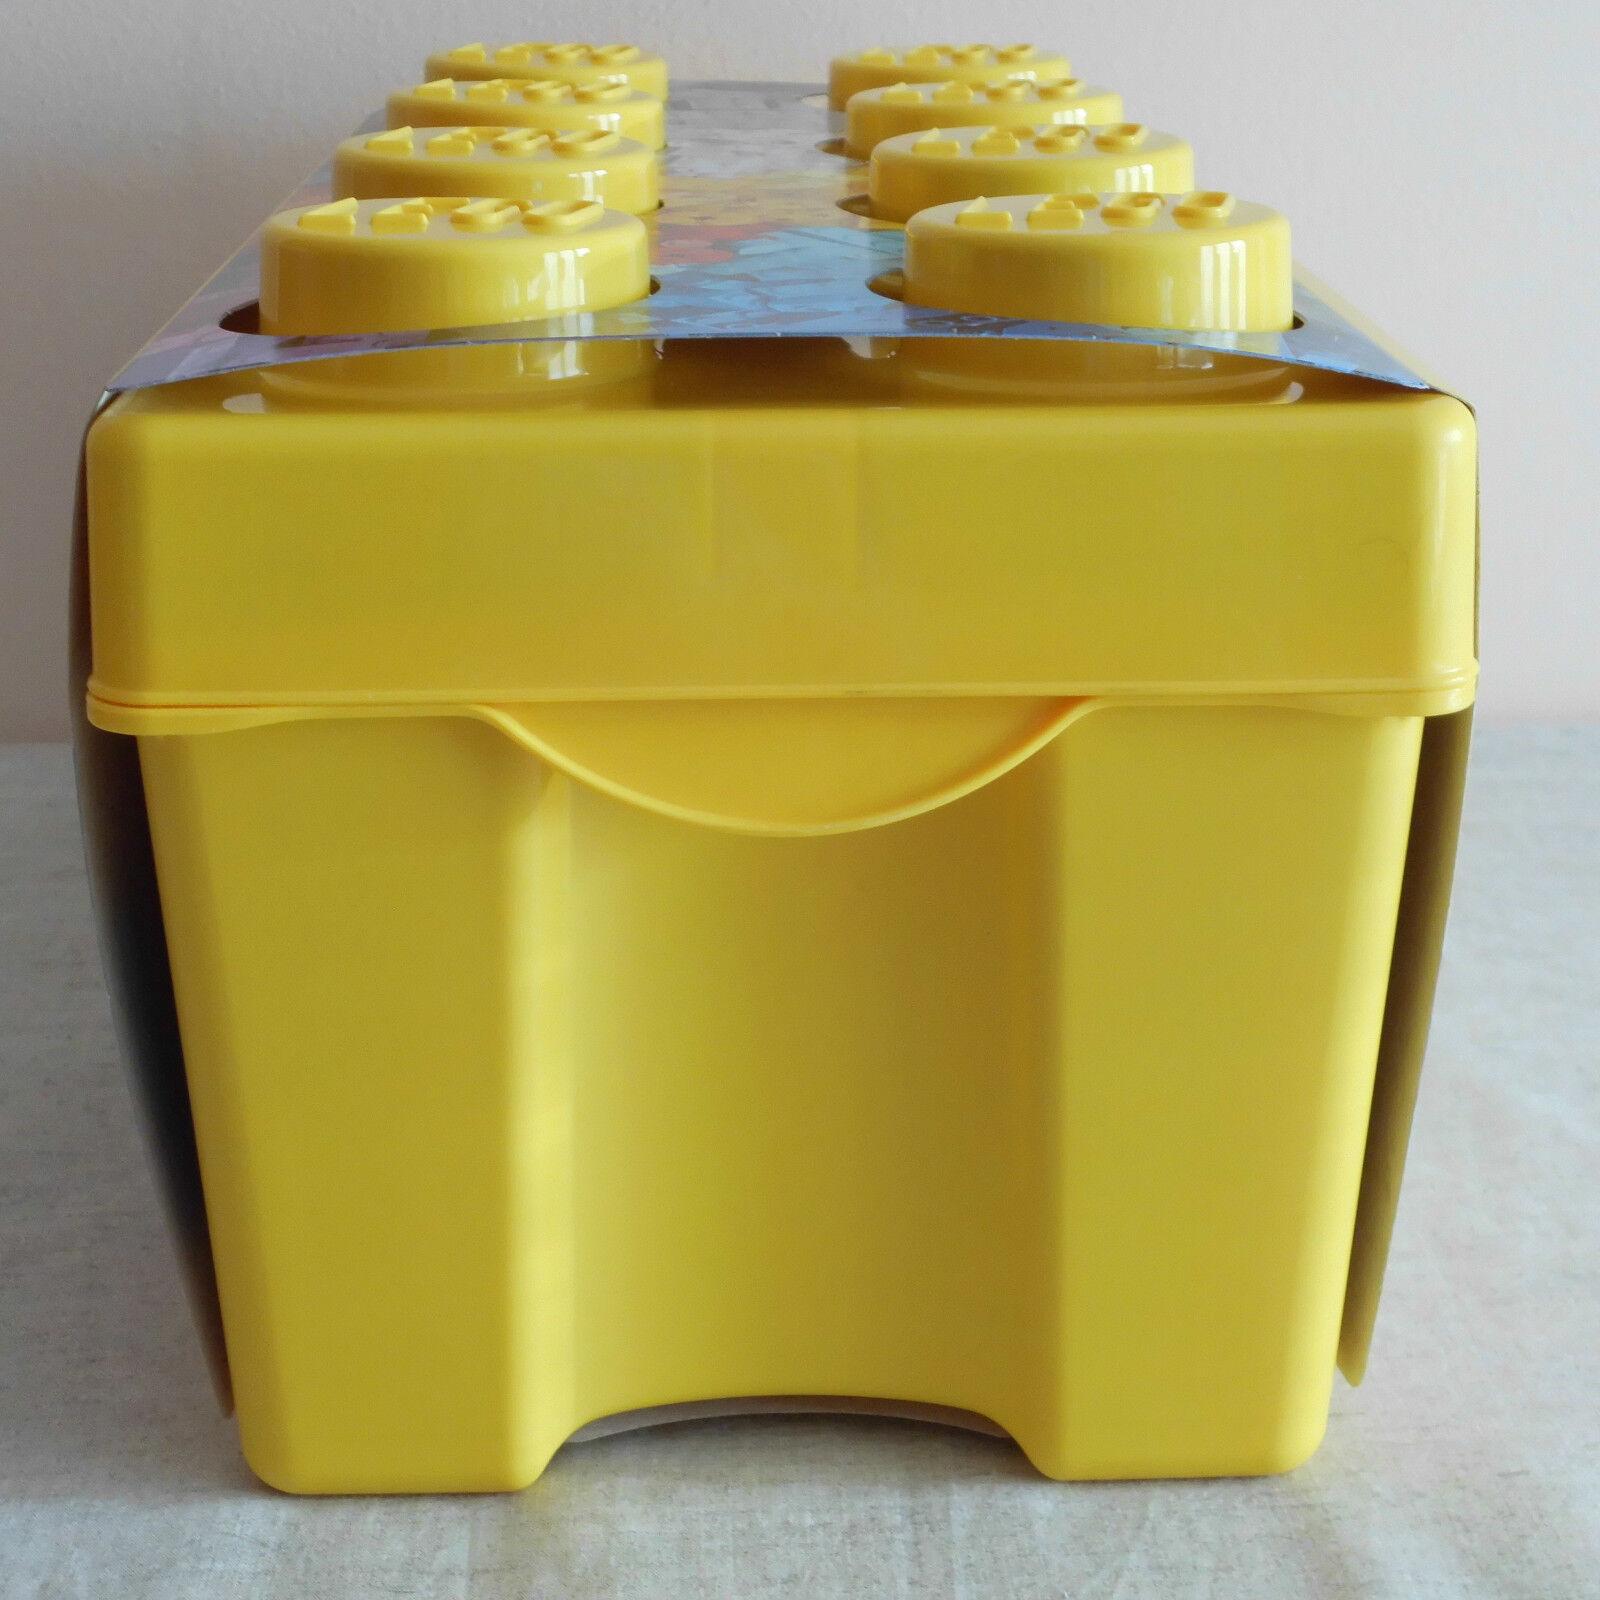 Lego 10696 10696 10696 B N Creative Brick Set With Plastic Storage Box. 484 Pieces. 9429ed